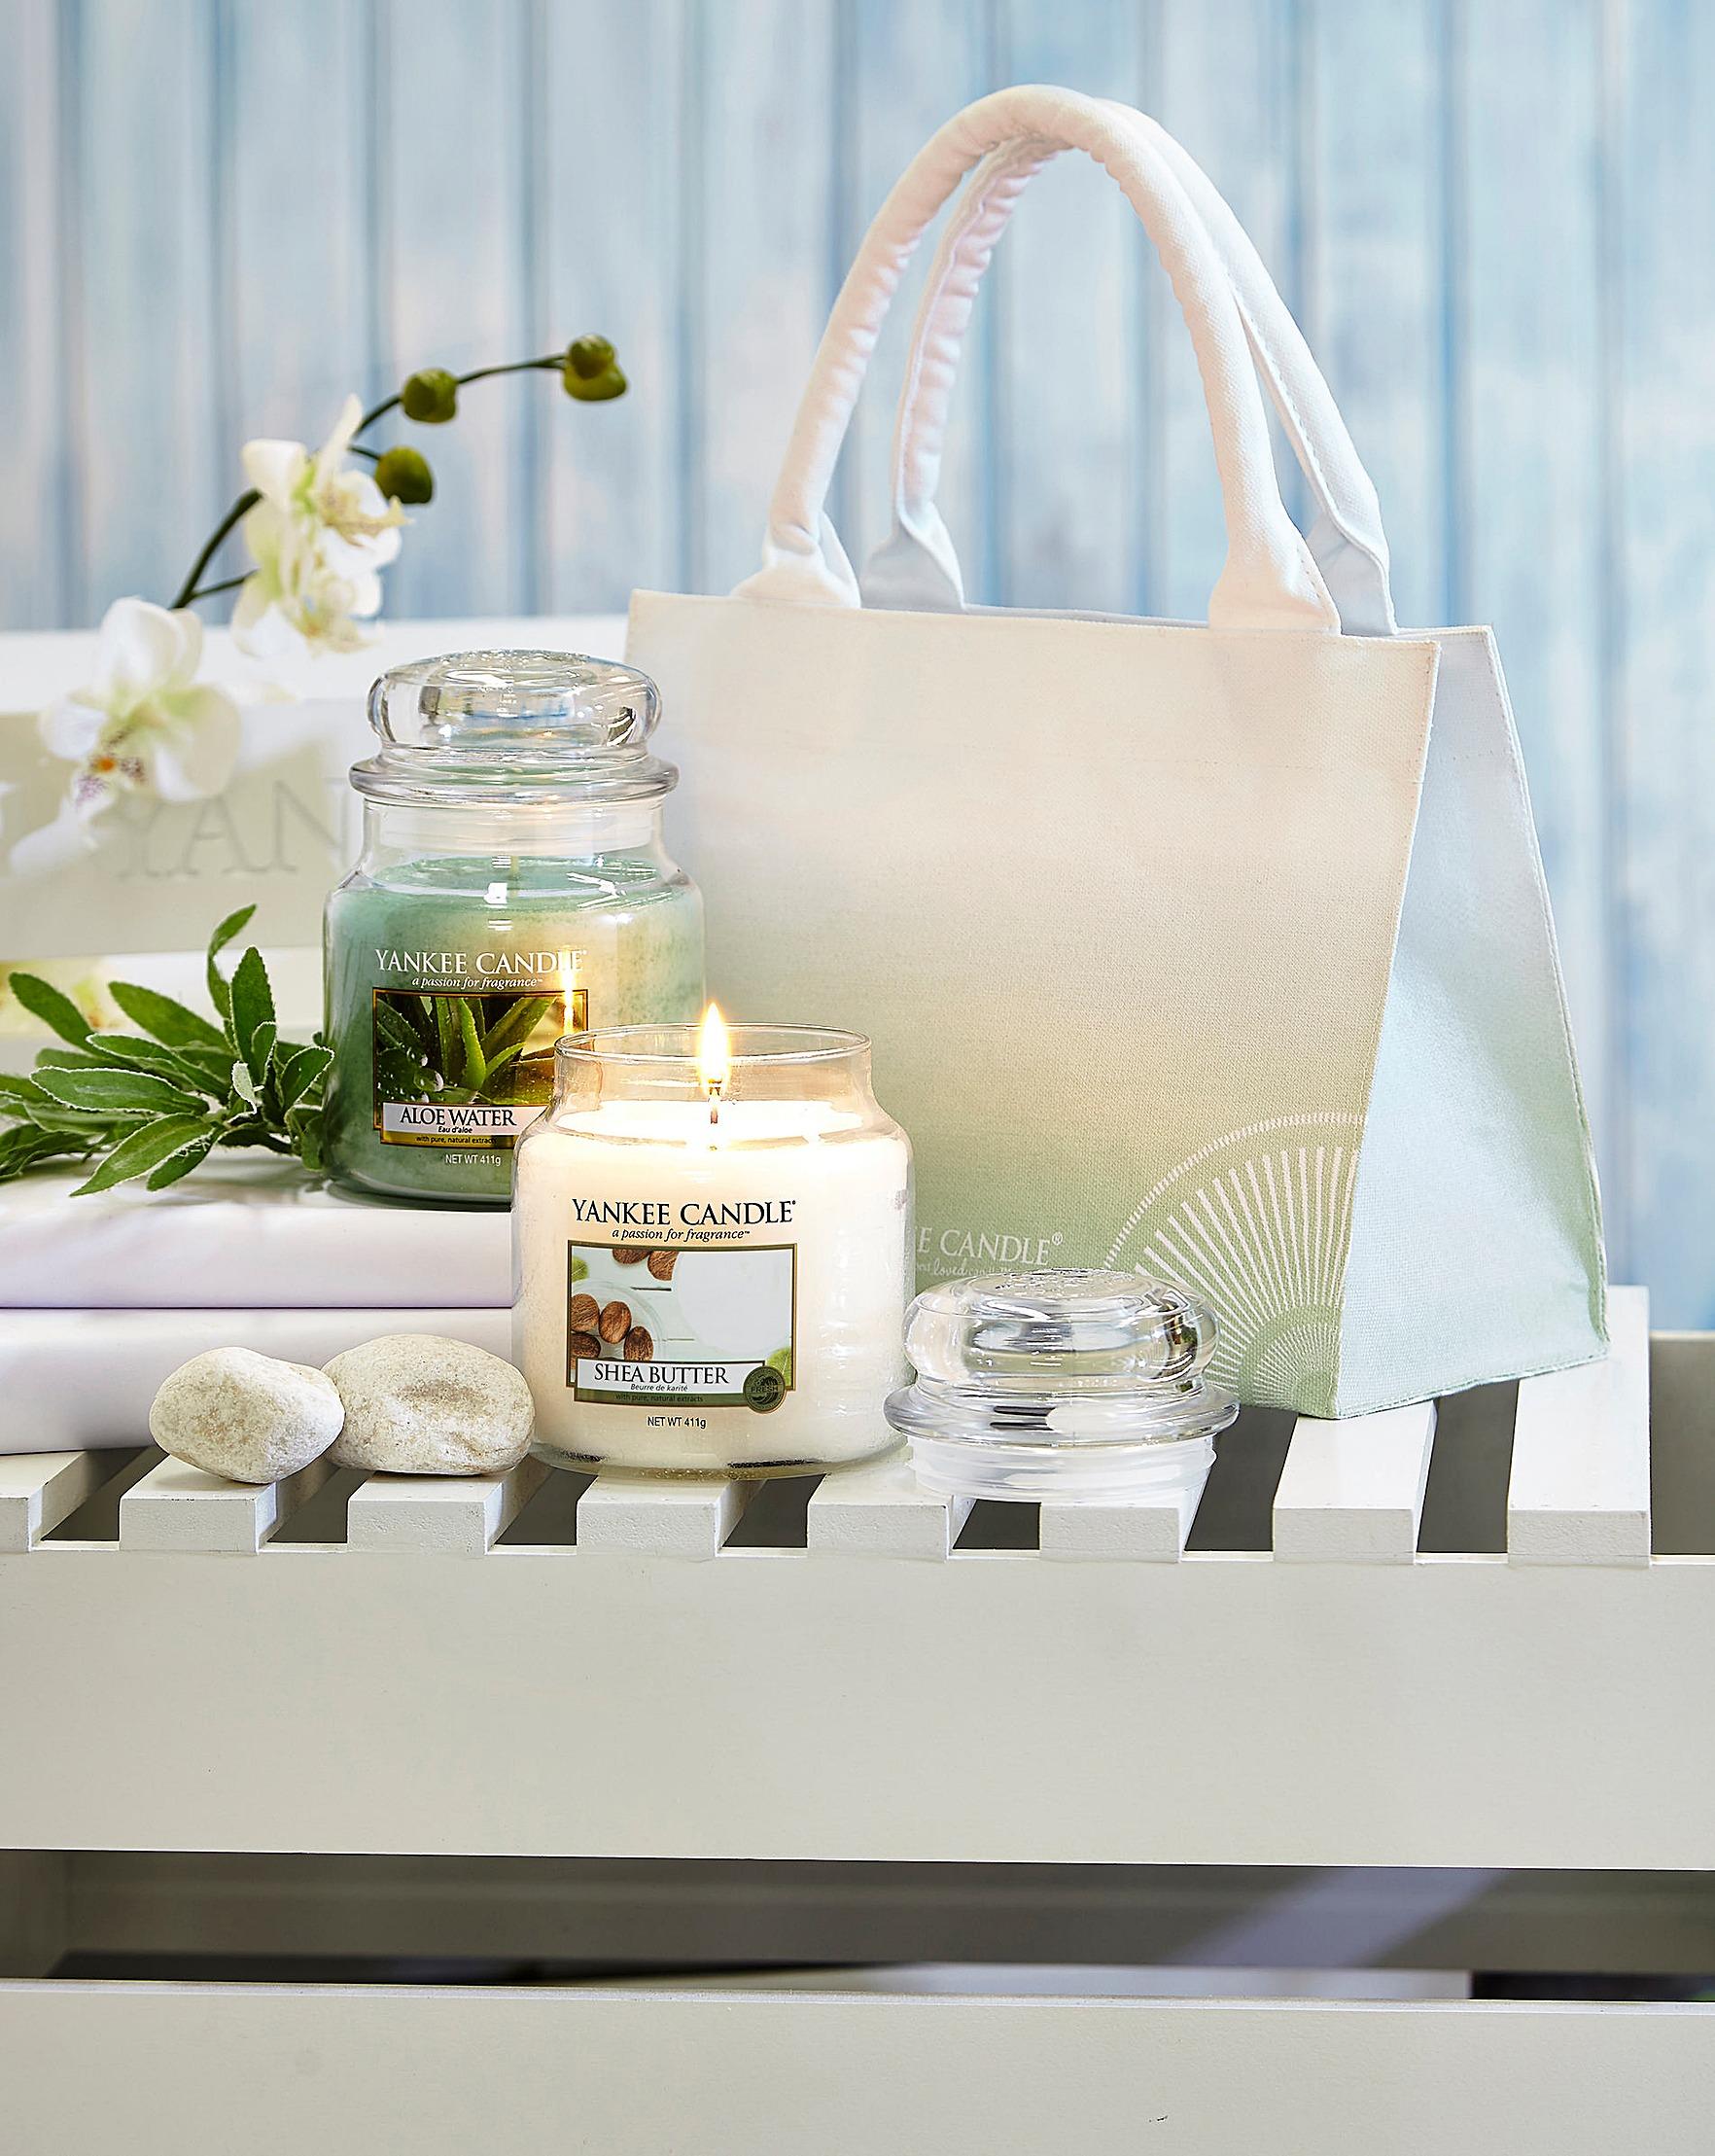 Yankee Candle Bag Gift Set | J D Williams